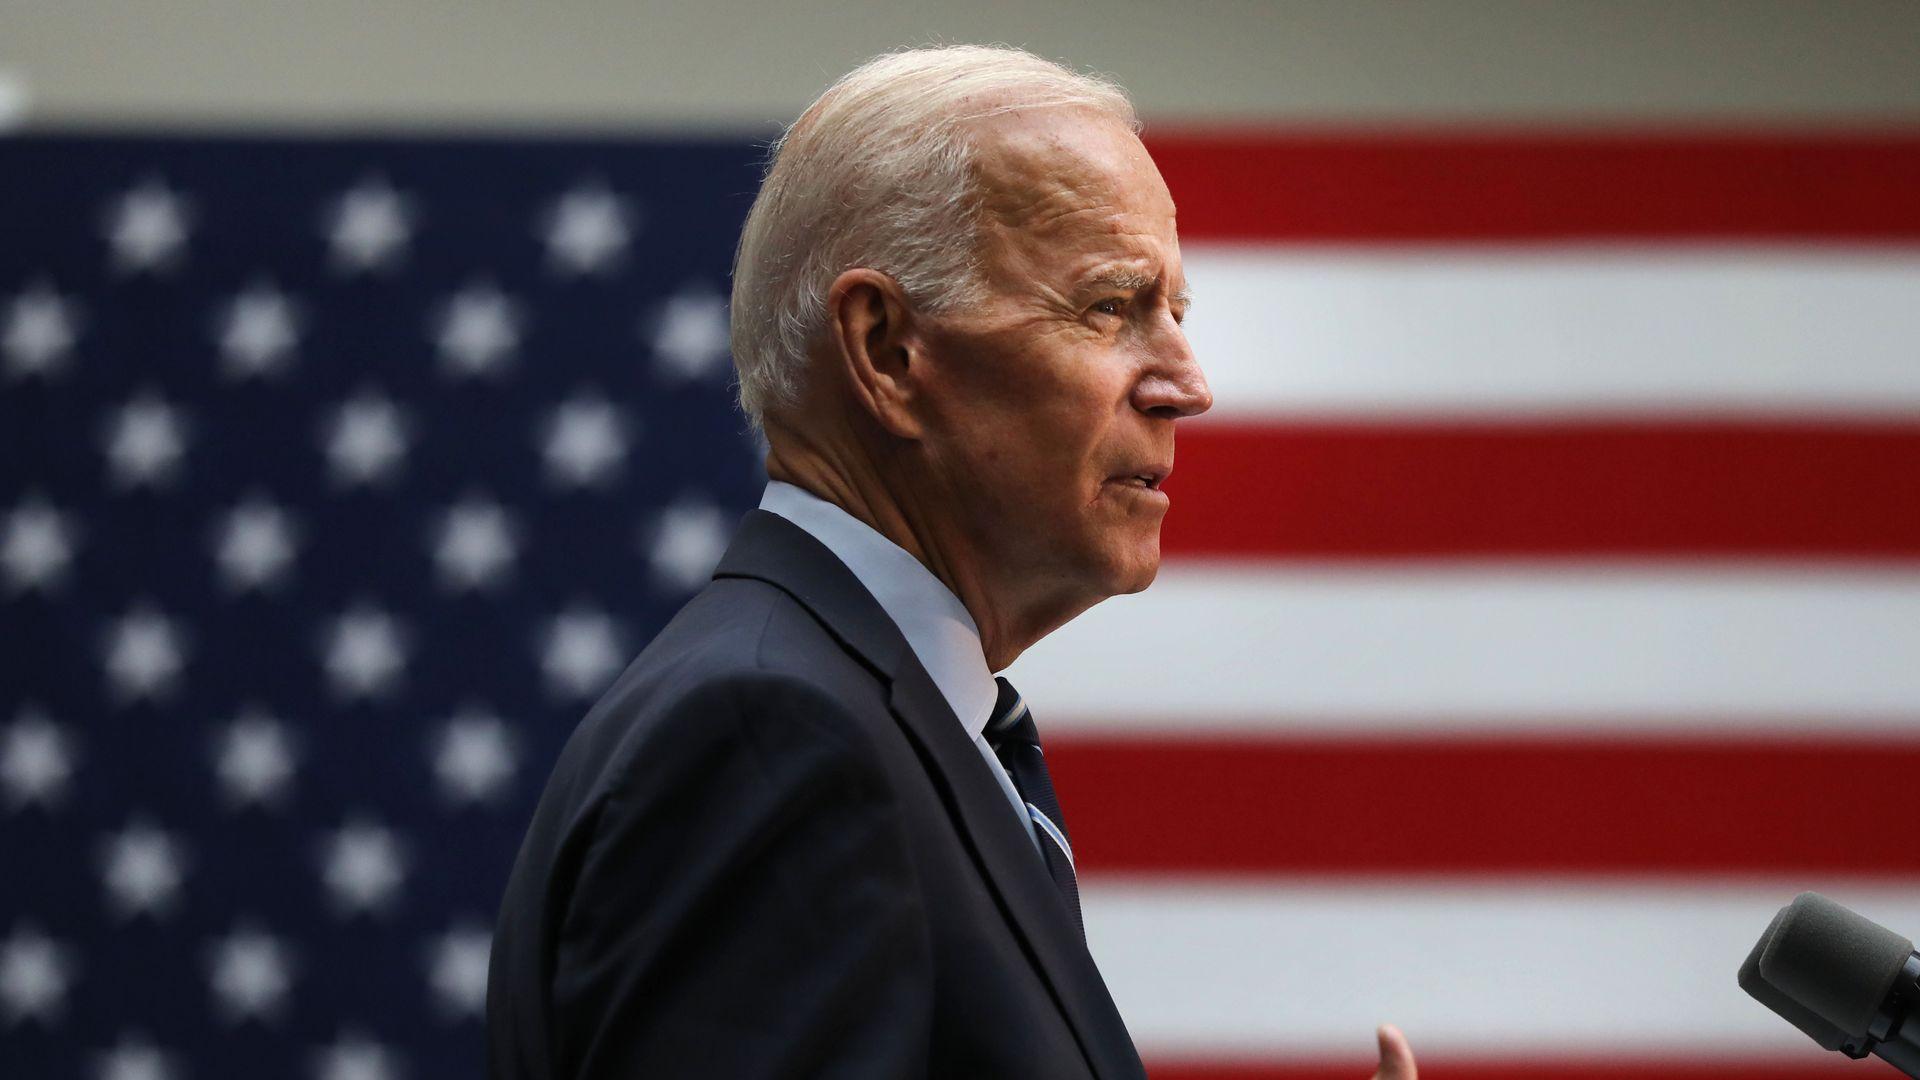 Joe Biden unveils plan for massive overhaul of the criminal justice system